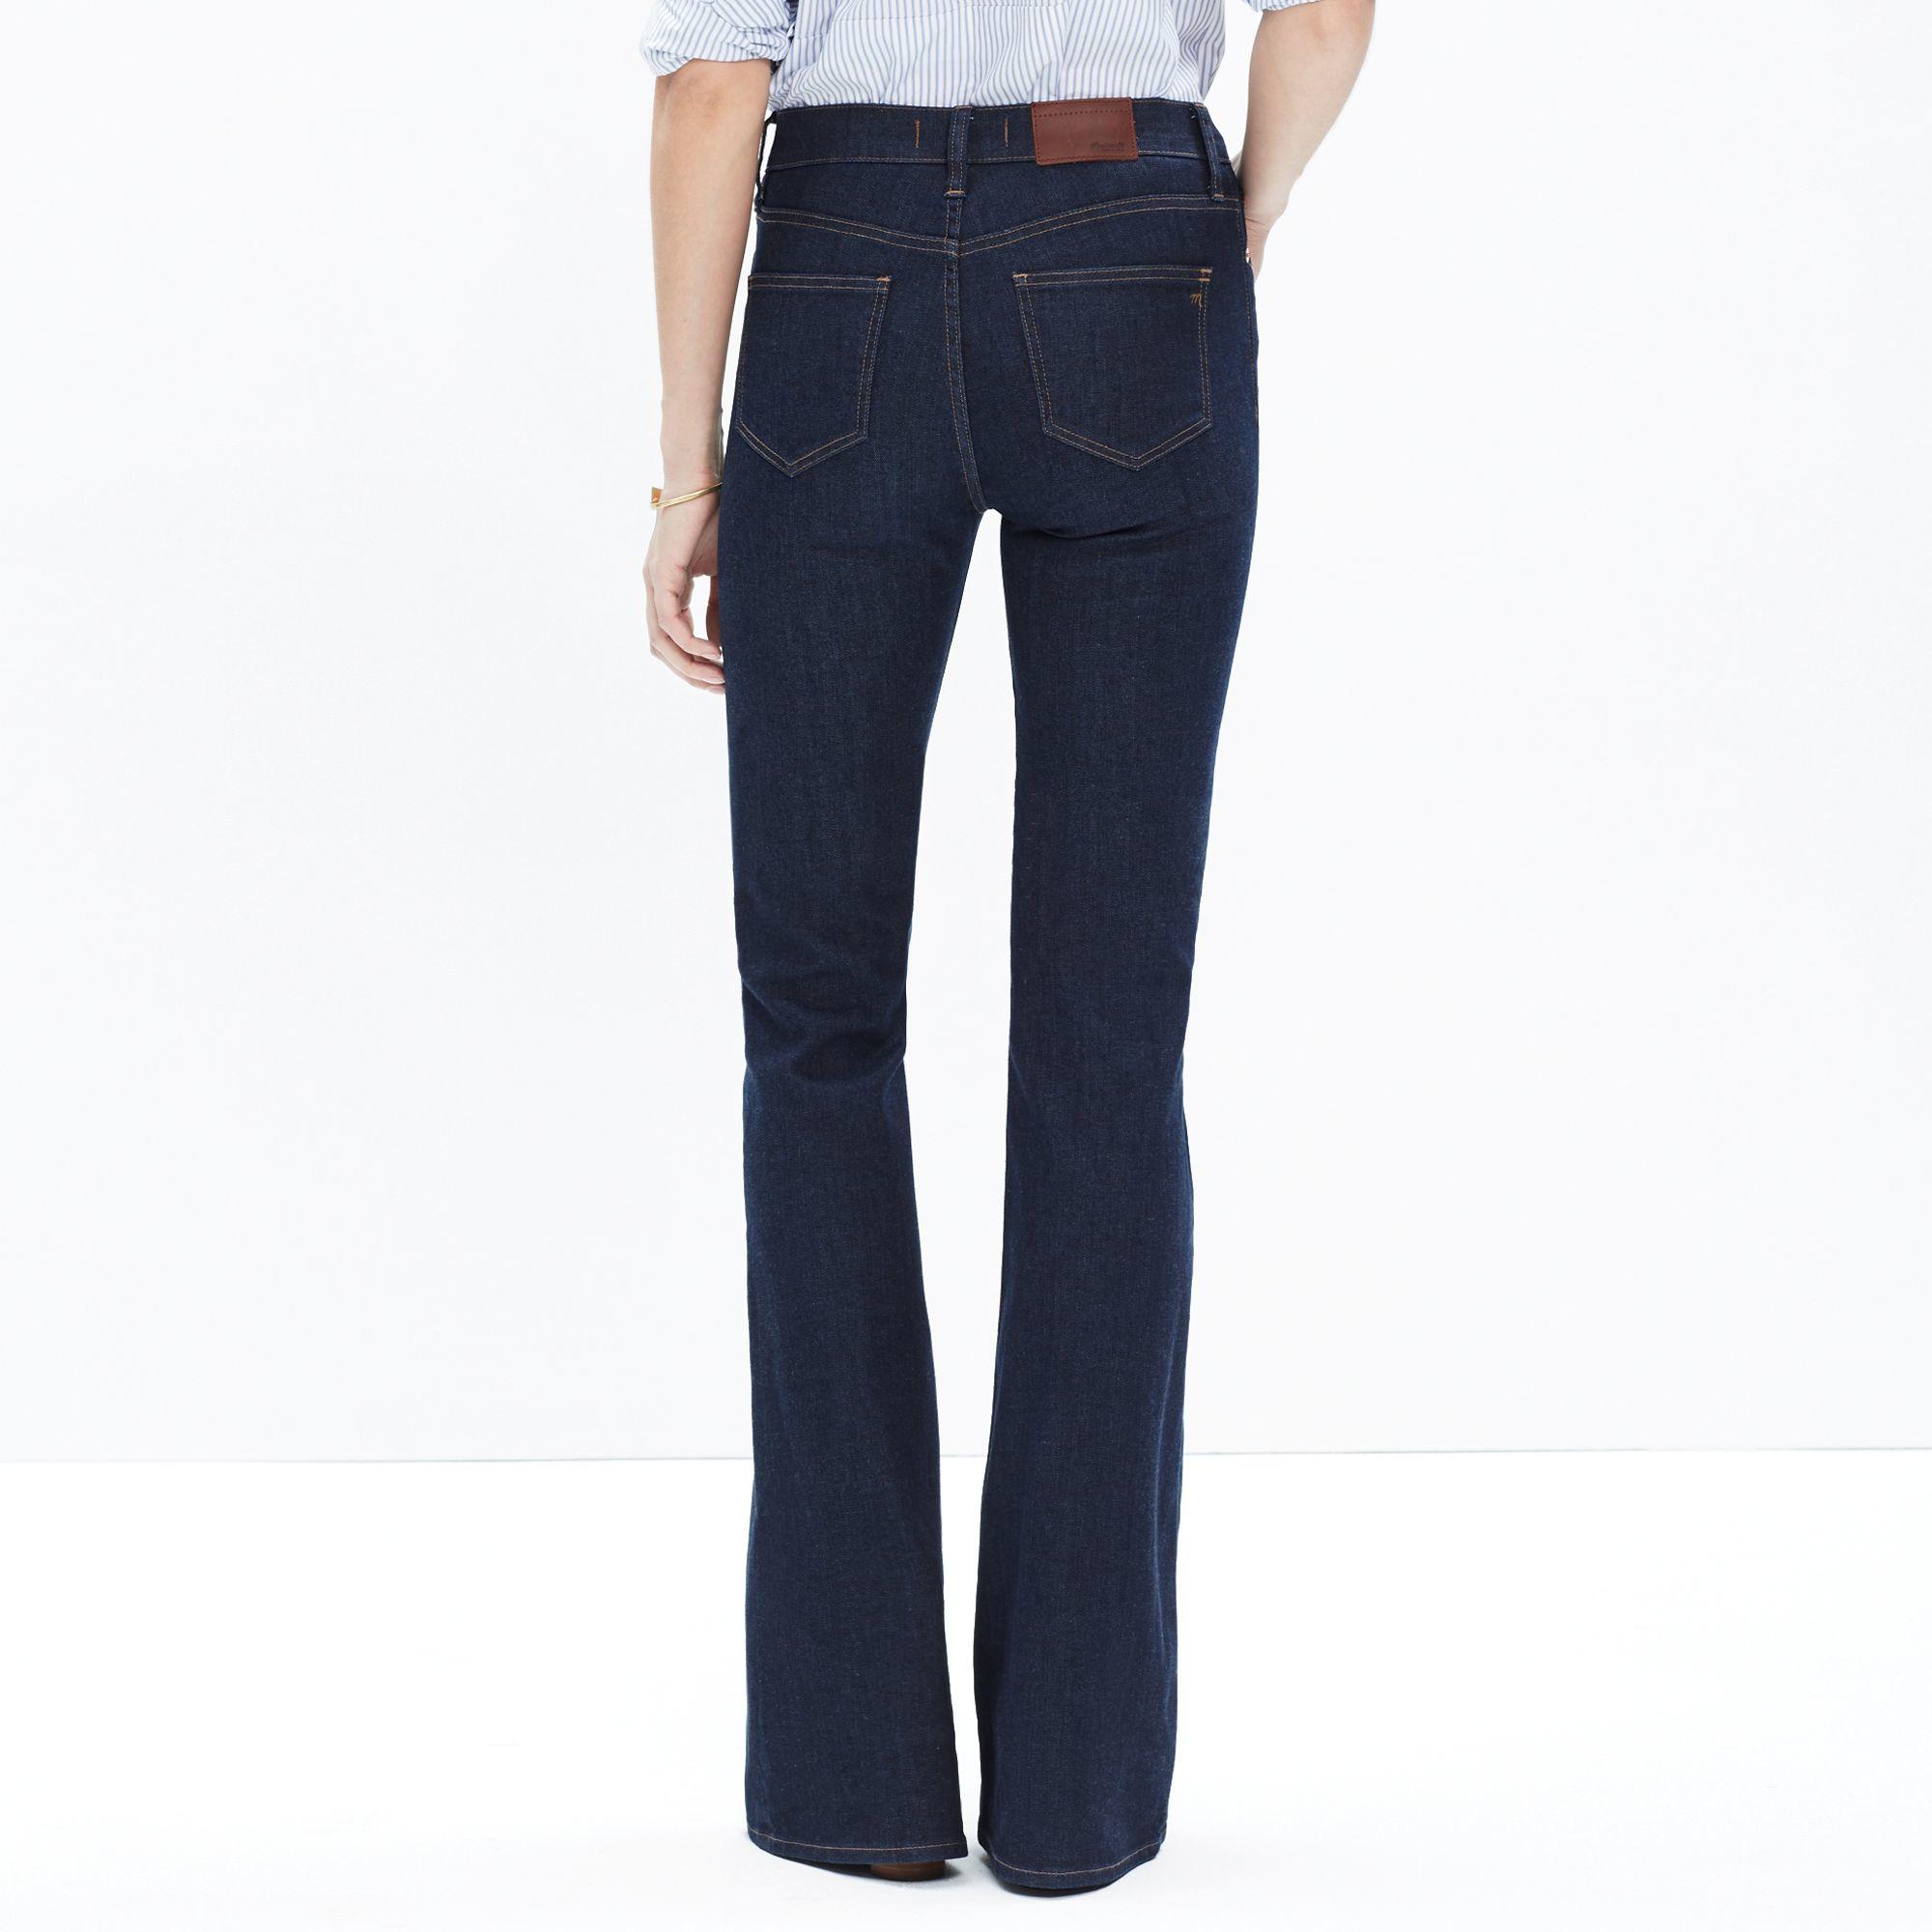 Madewell Flea Market Flare Jeans In Kenner Wash in Blue | Lyst